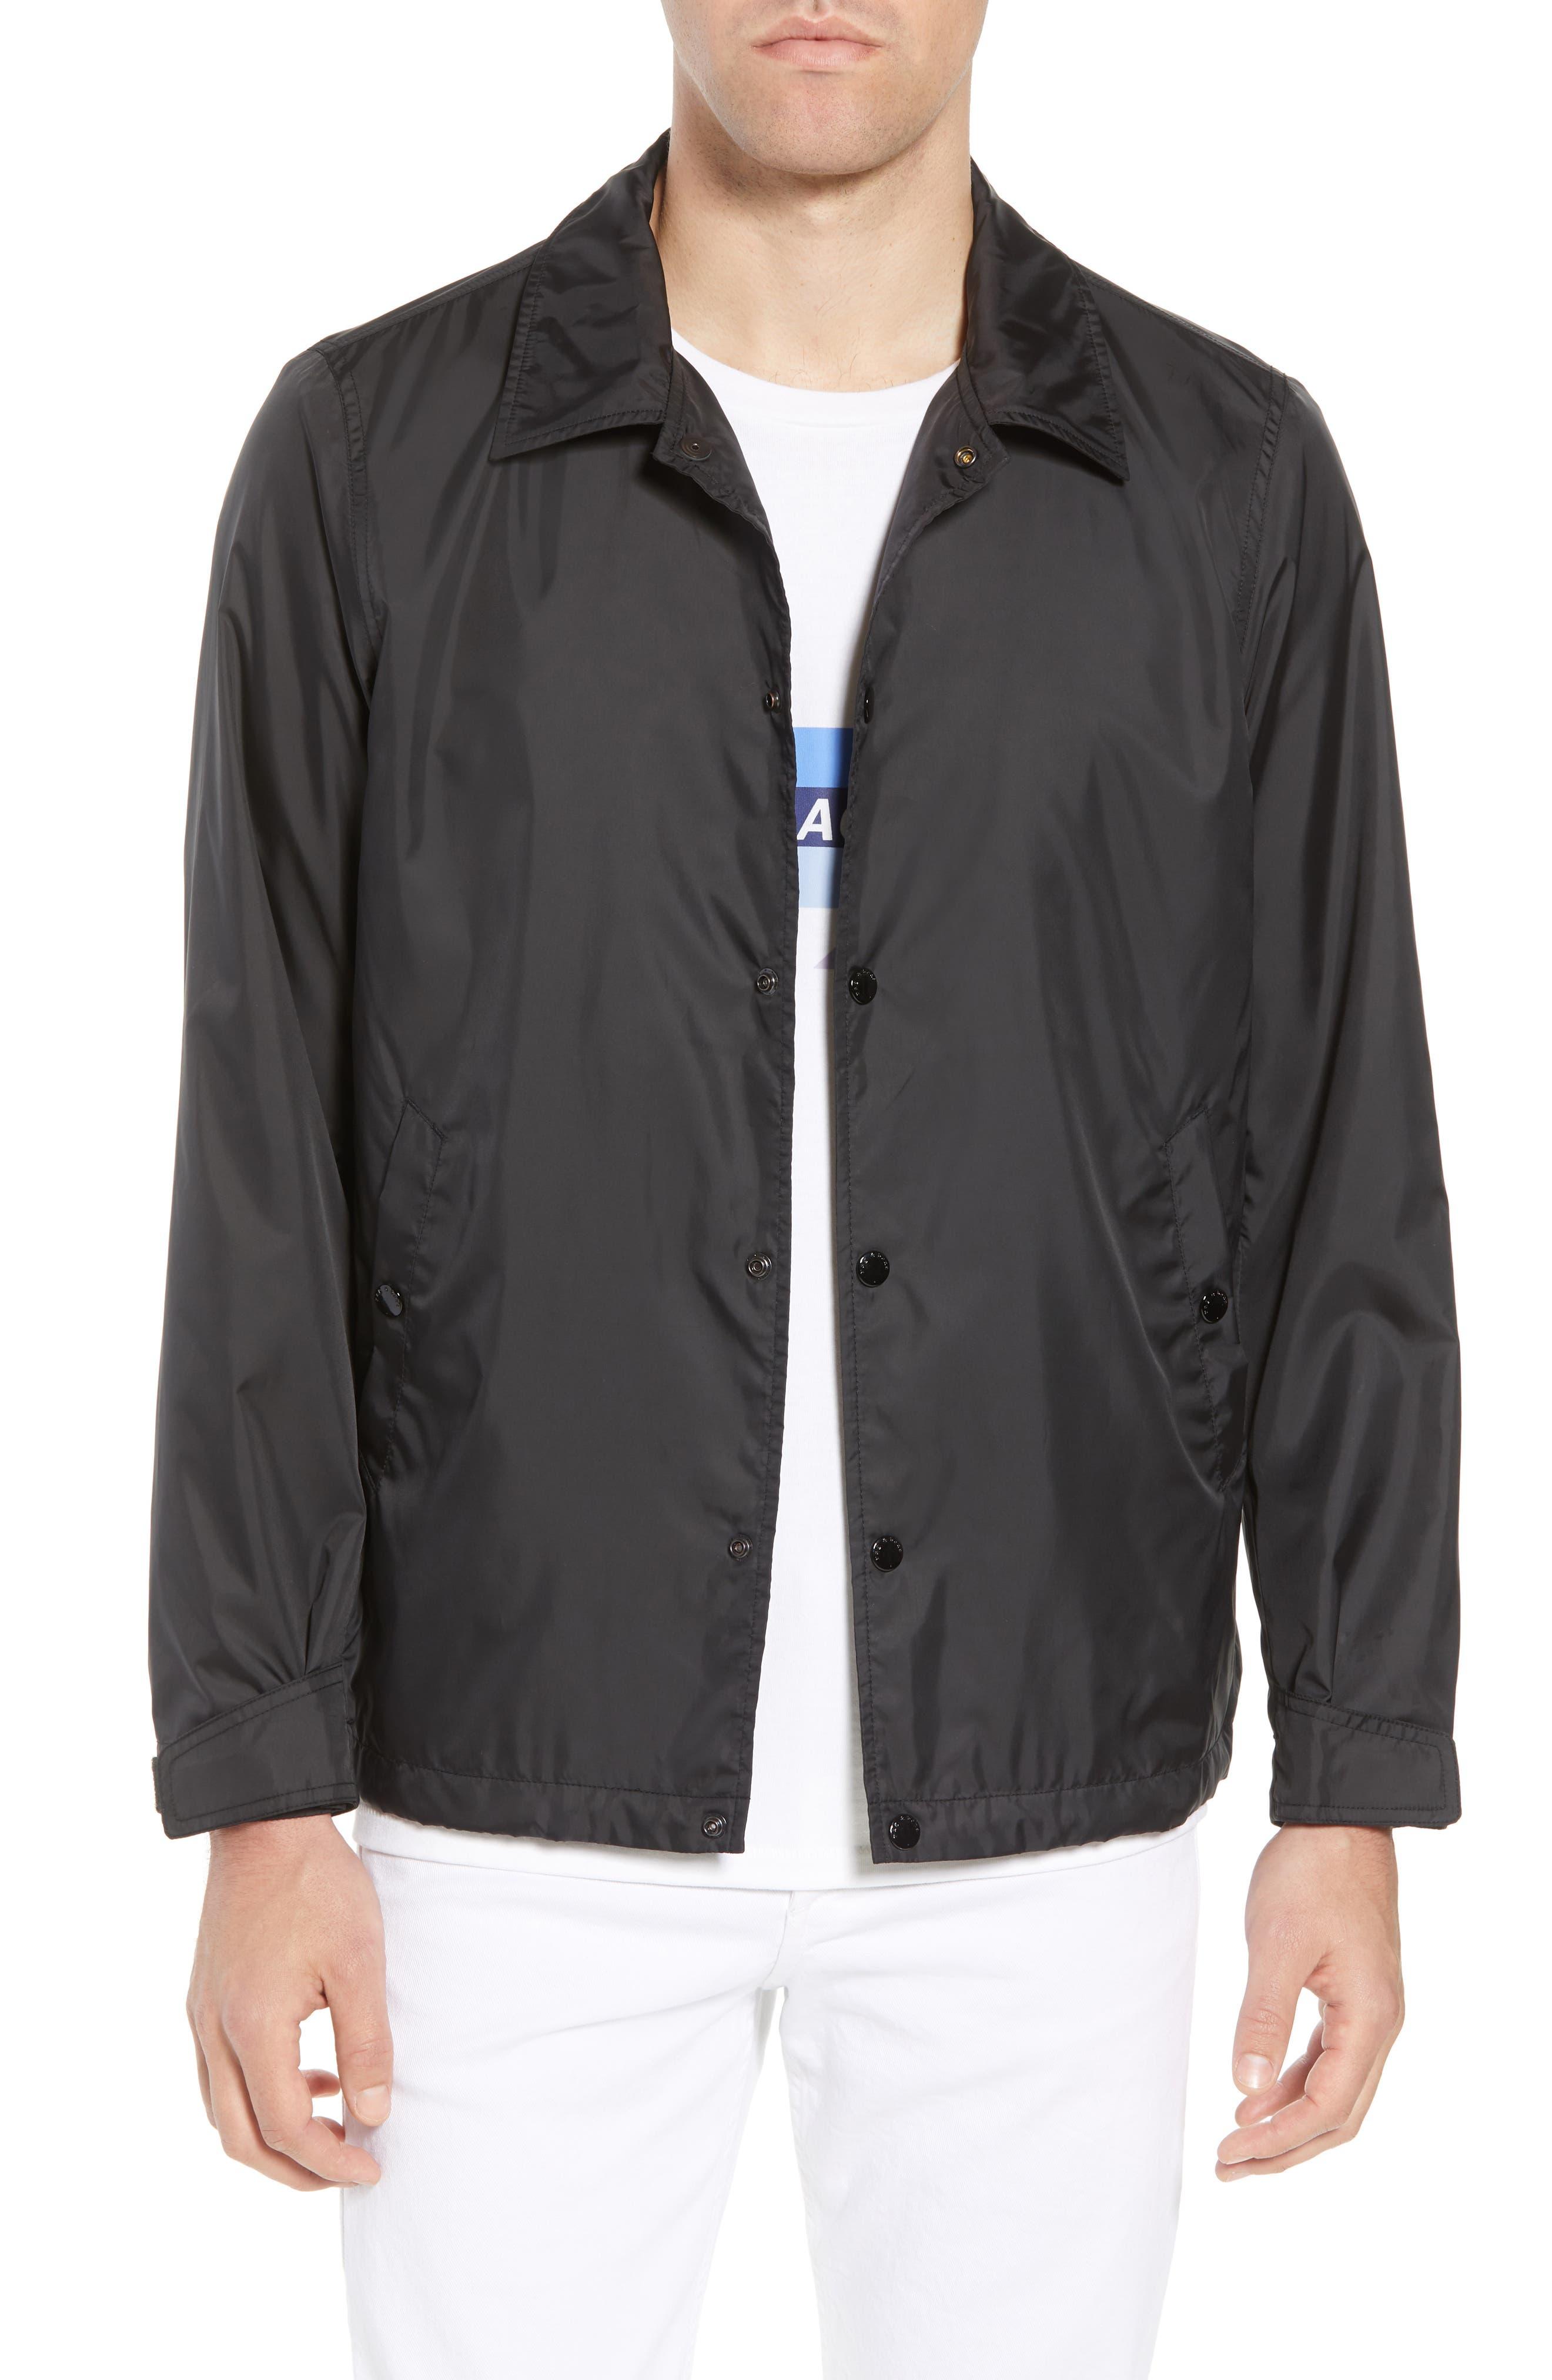 Coaches Jacket,                             Main thumbnail 1, color,                             Black